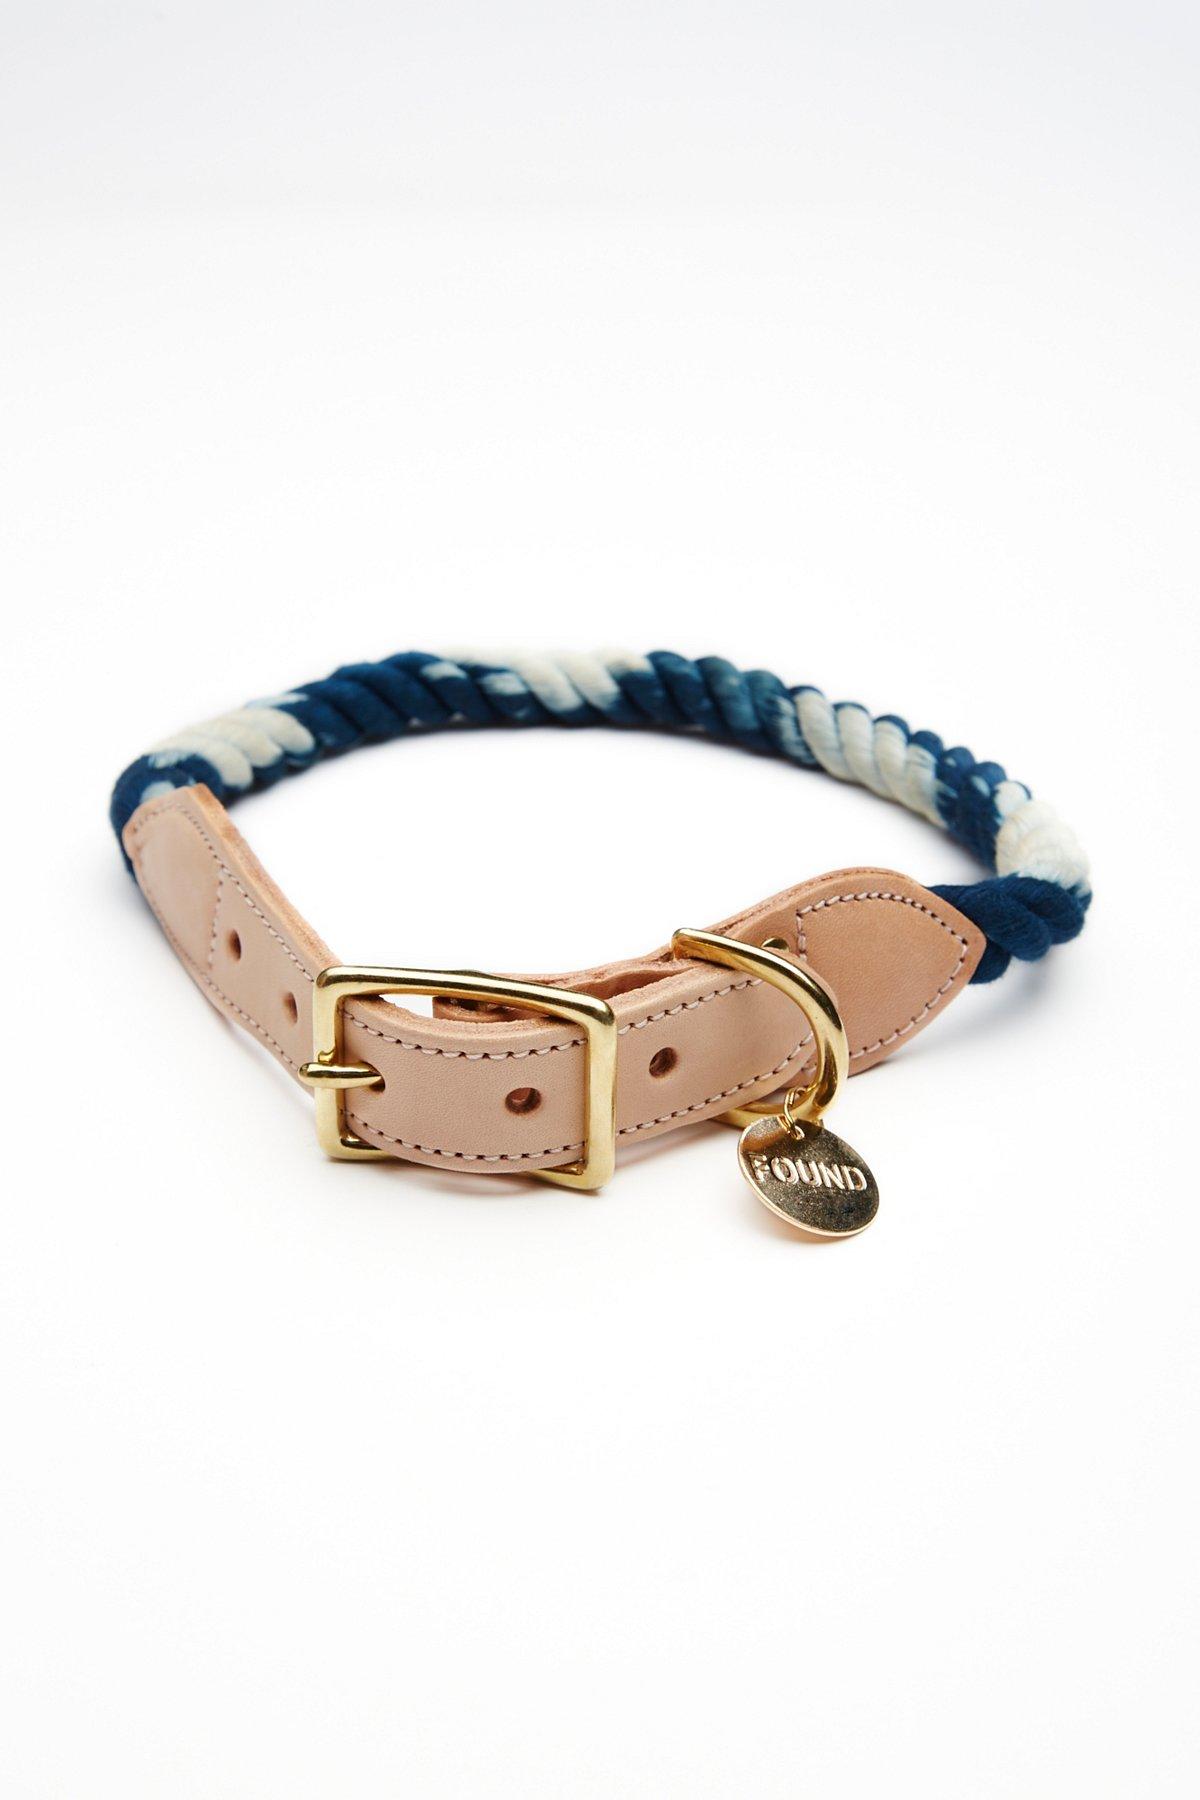 Marble Dog Collar